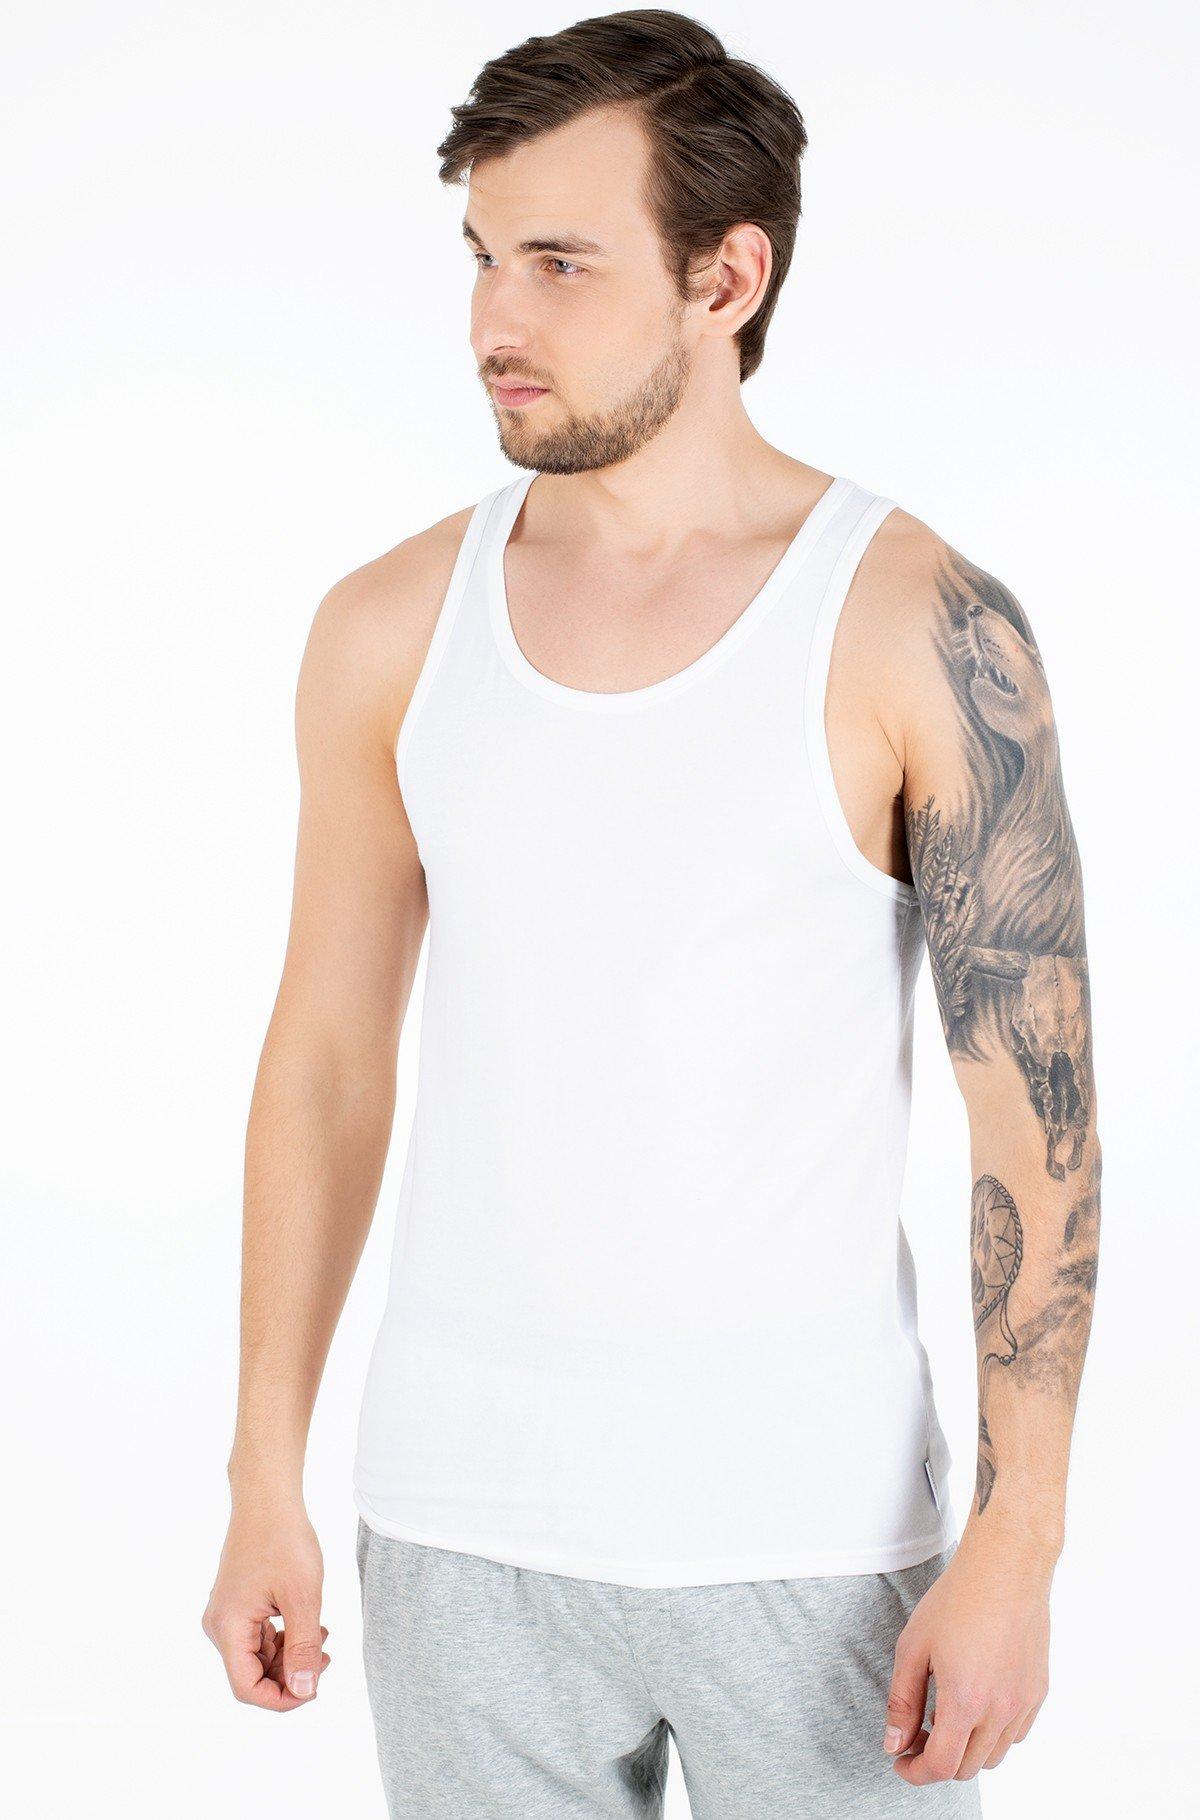 2 vnt. apatinių marškinių 000NB1099A-full-1